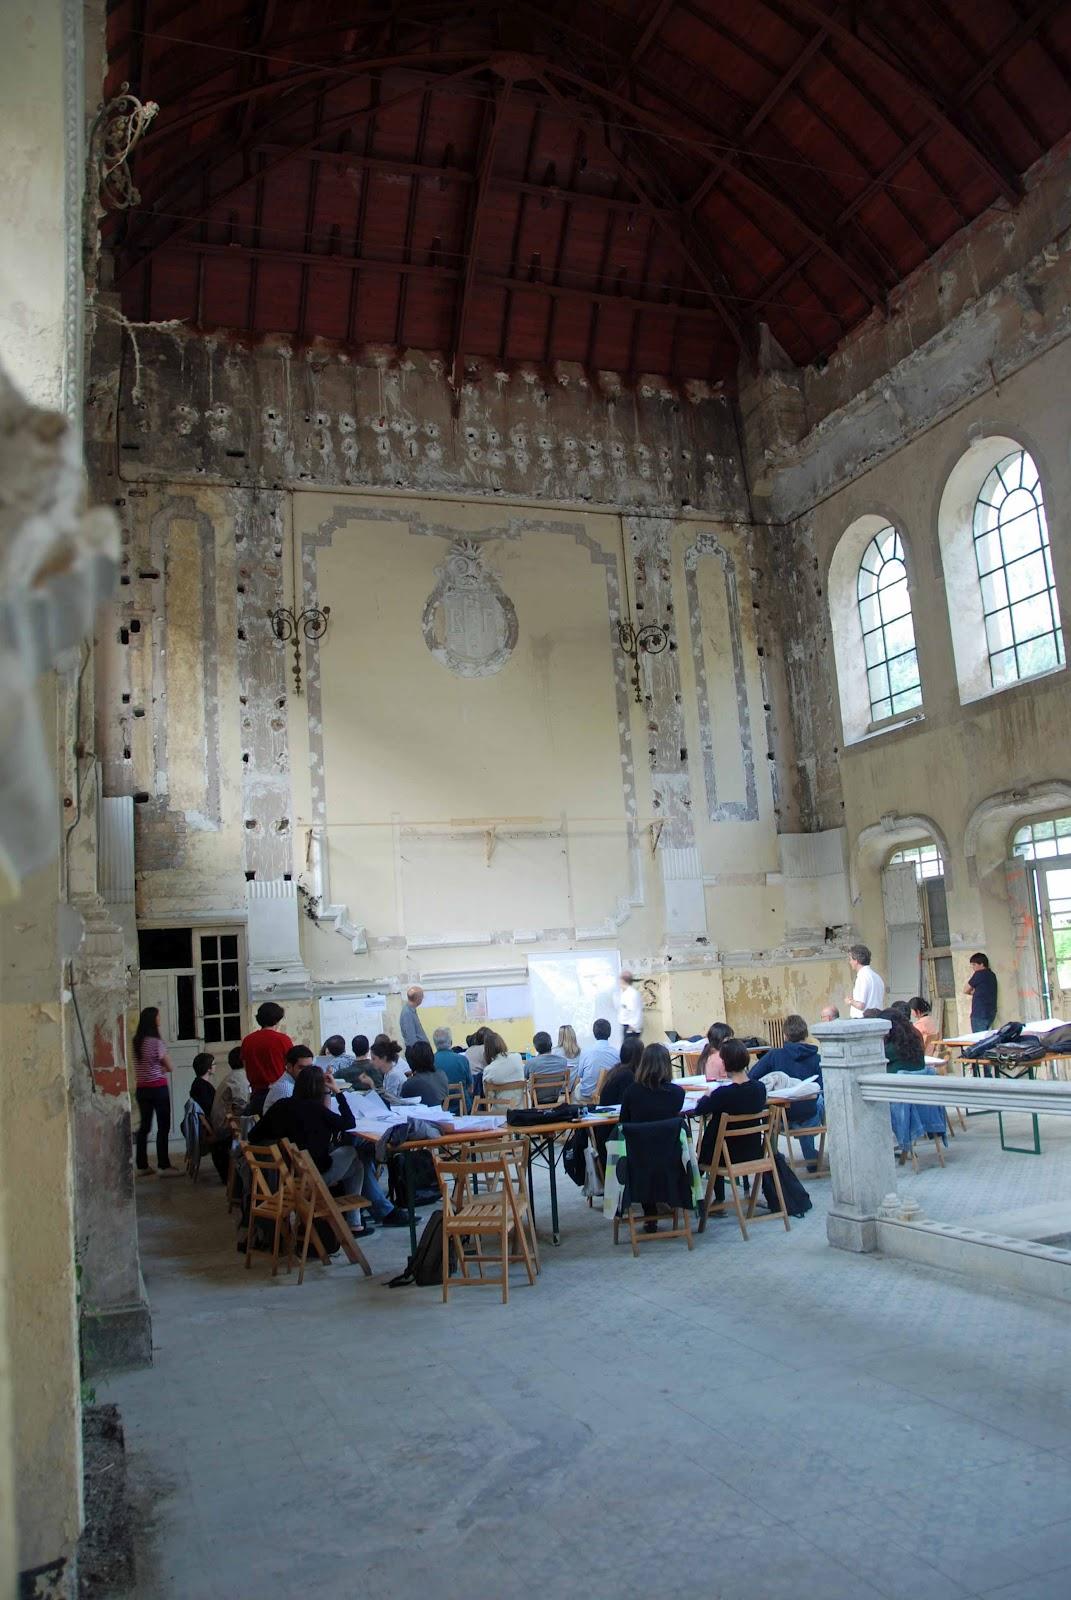 URBANISMO. Universidad de Zaragoza: REPENSAR CANFRANC Sobre el ...